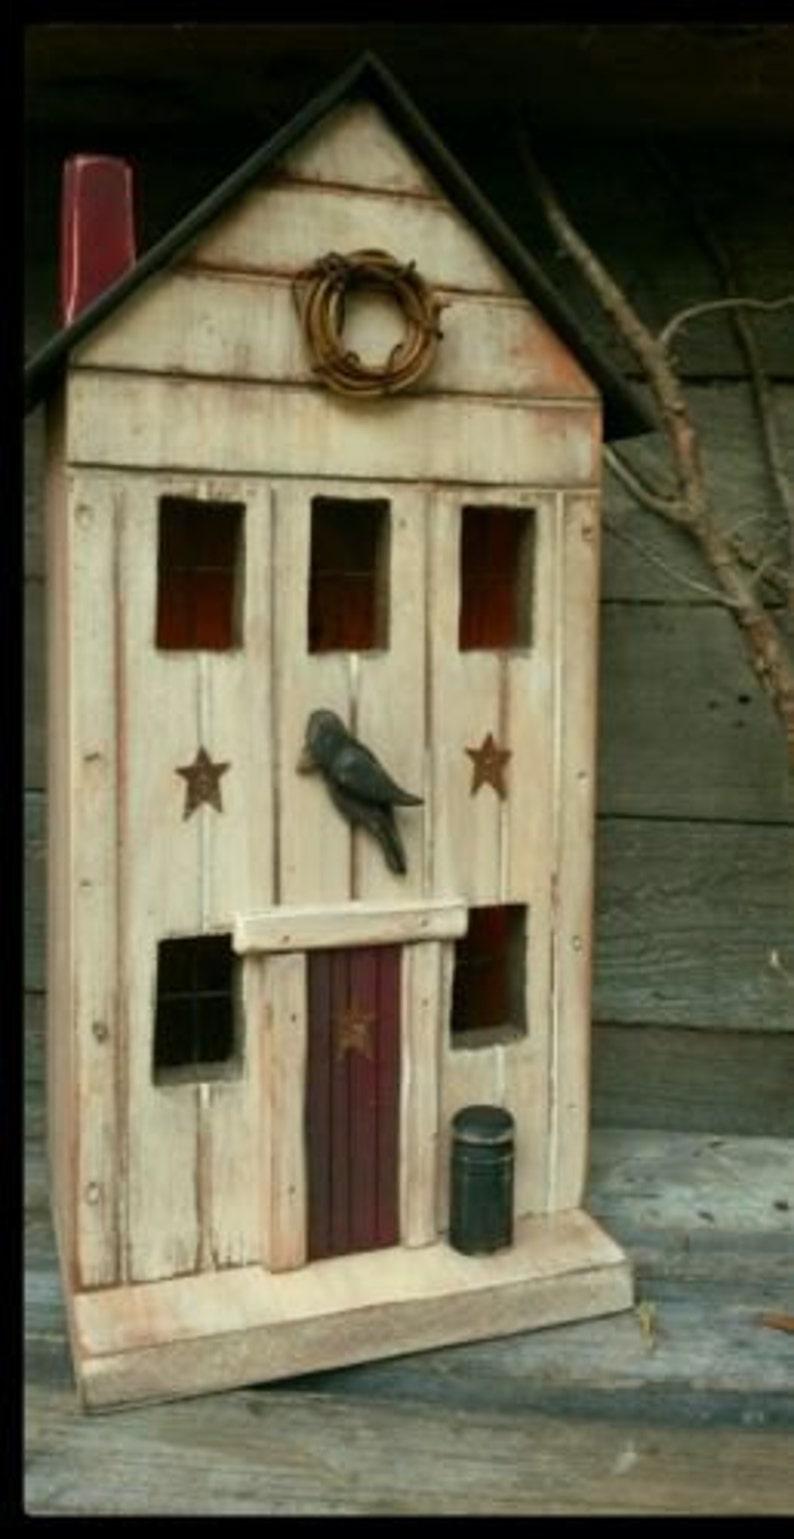 Primitive Birdhouse Primitive Farmhouse Primitive Crow Black Crow Folk Art Lighted House Rustic Birdhouse Farmhouse Decor Primitives